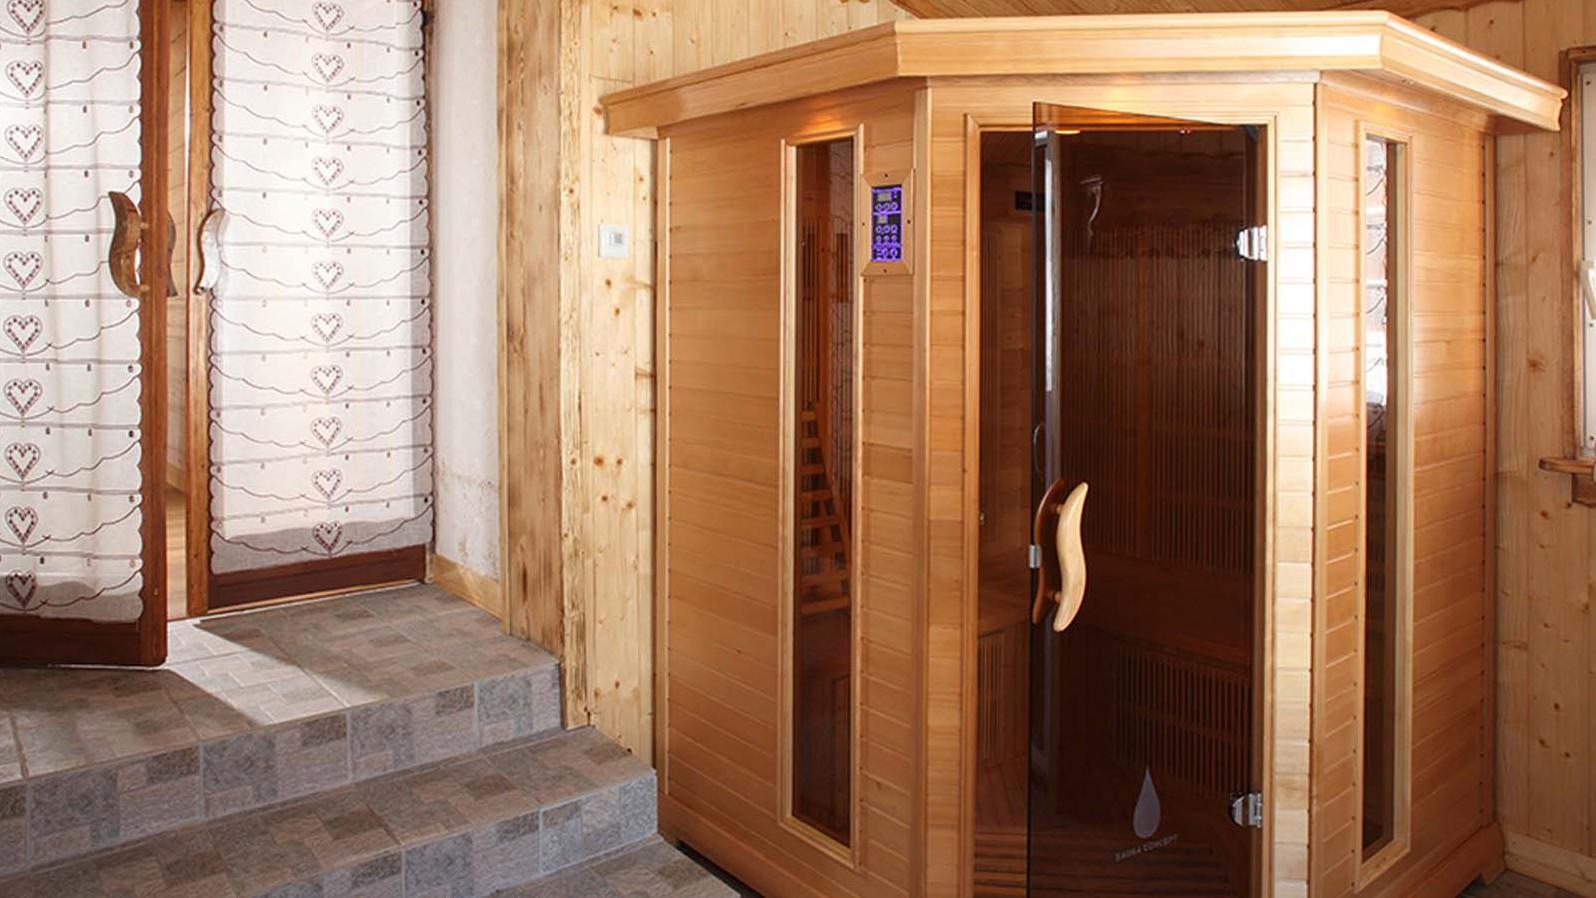 Sauna - Chalet Naomi, Alpe D'Huez, France